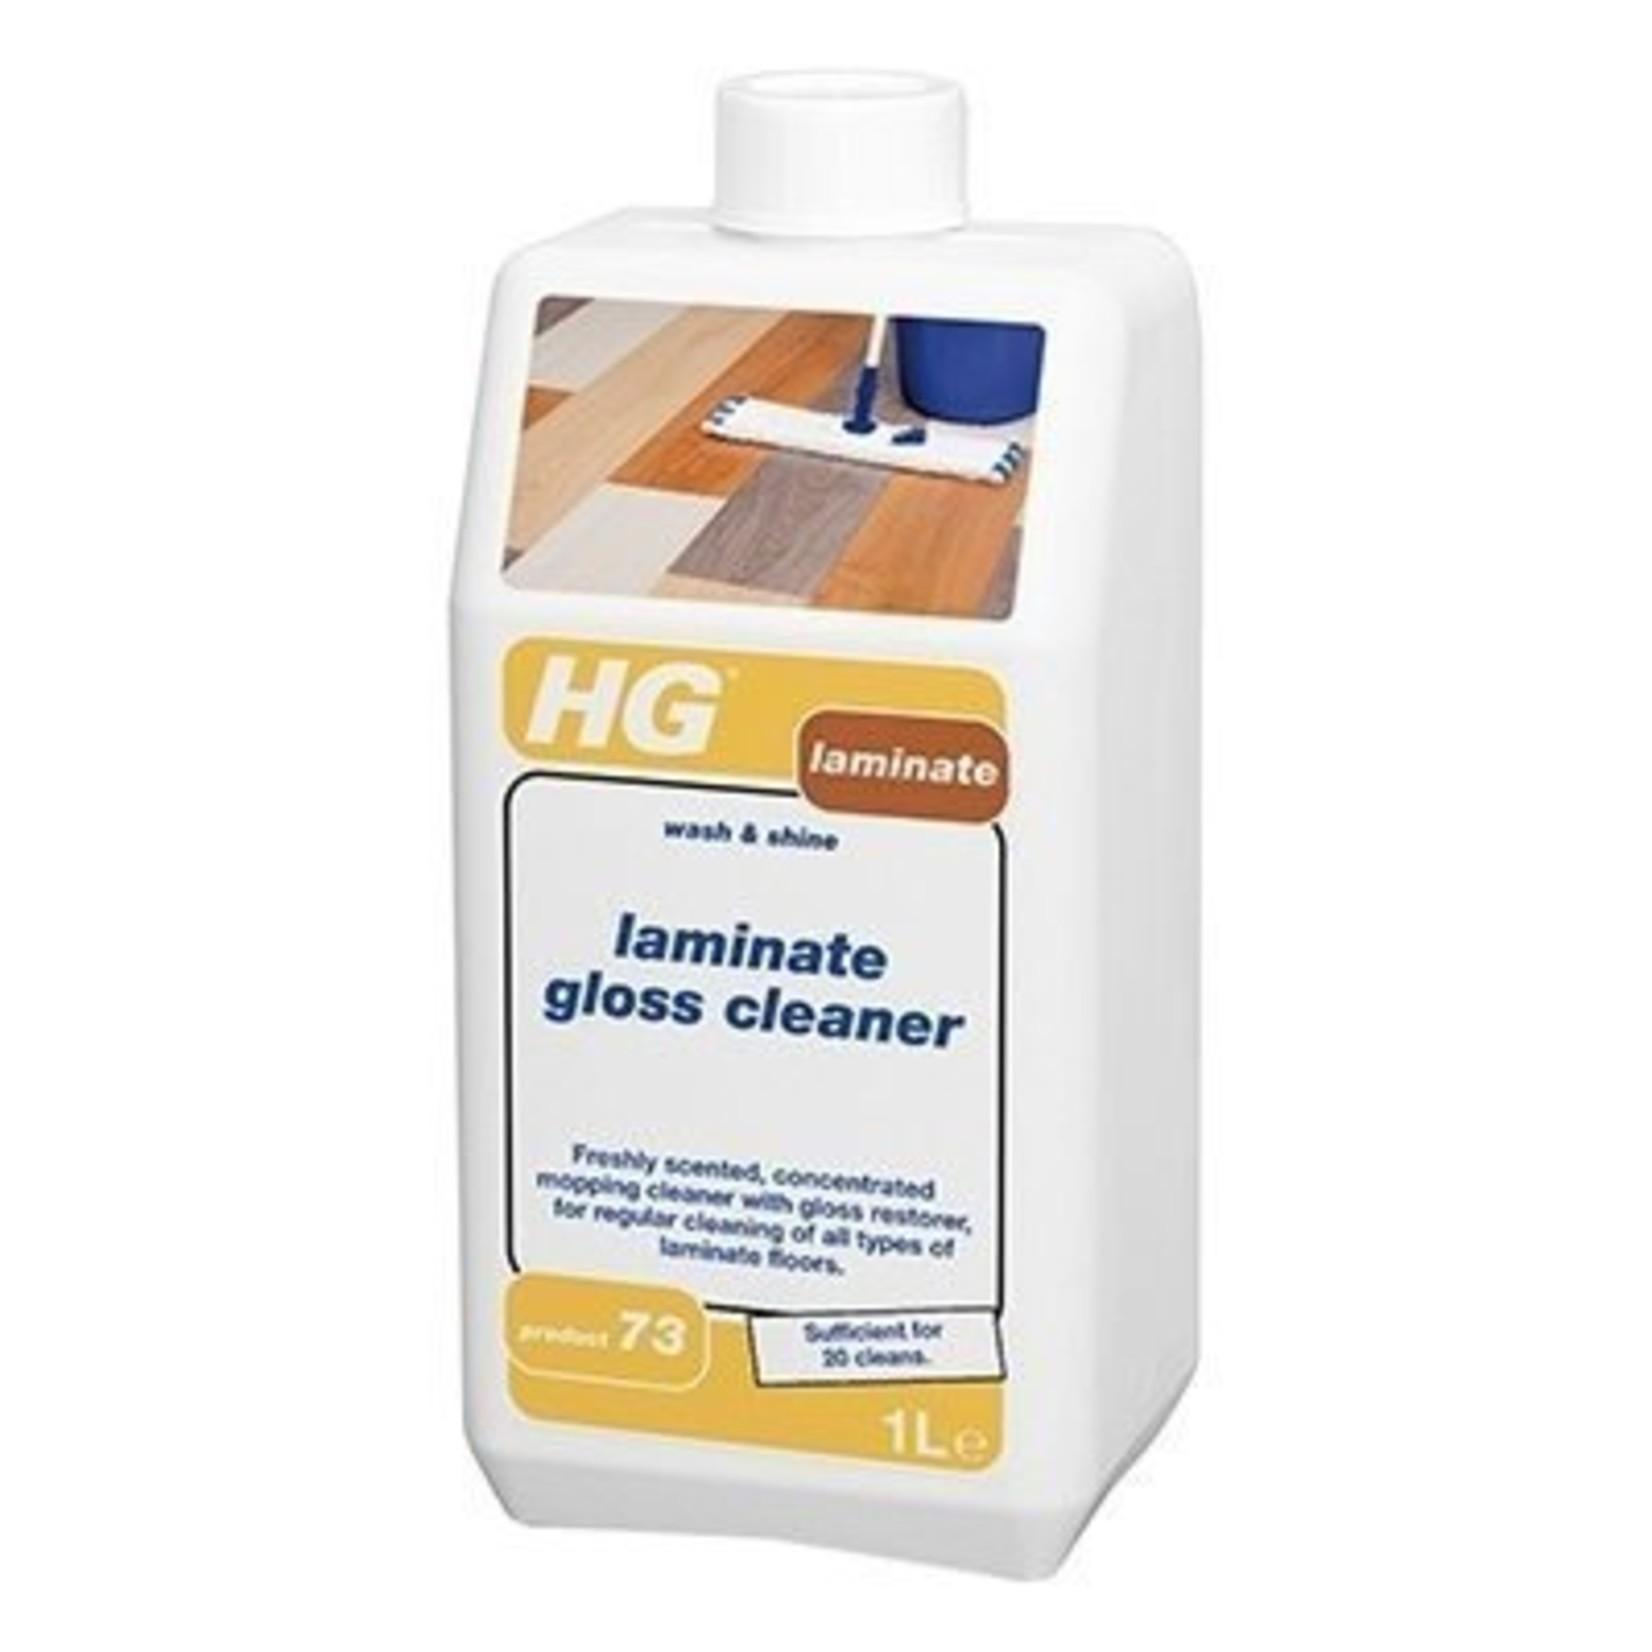 HG HG LAMINATE GLOSS CLEANER P.73